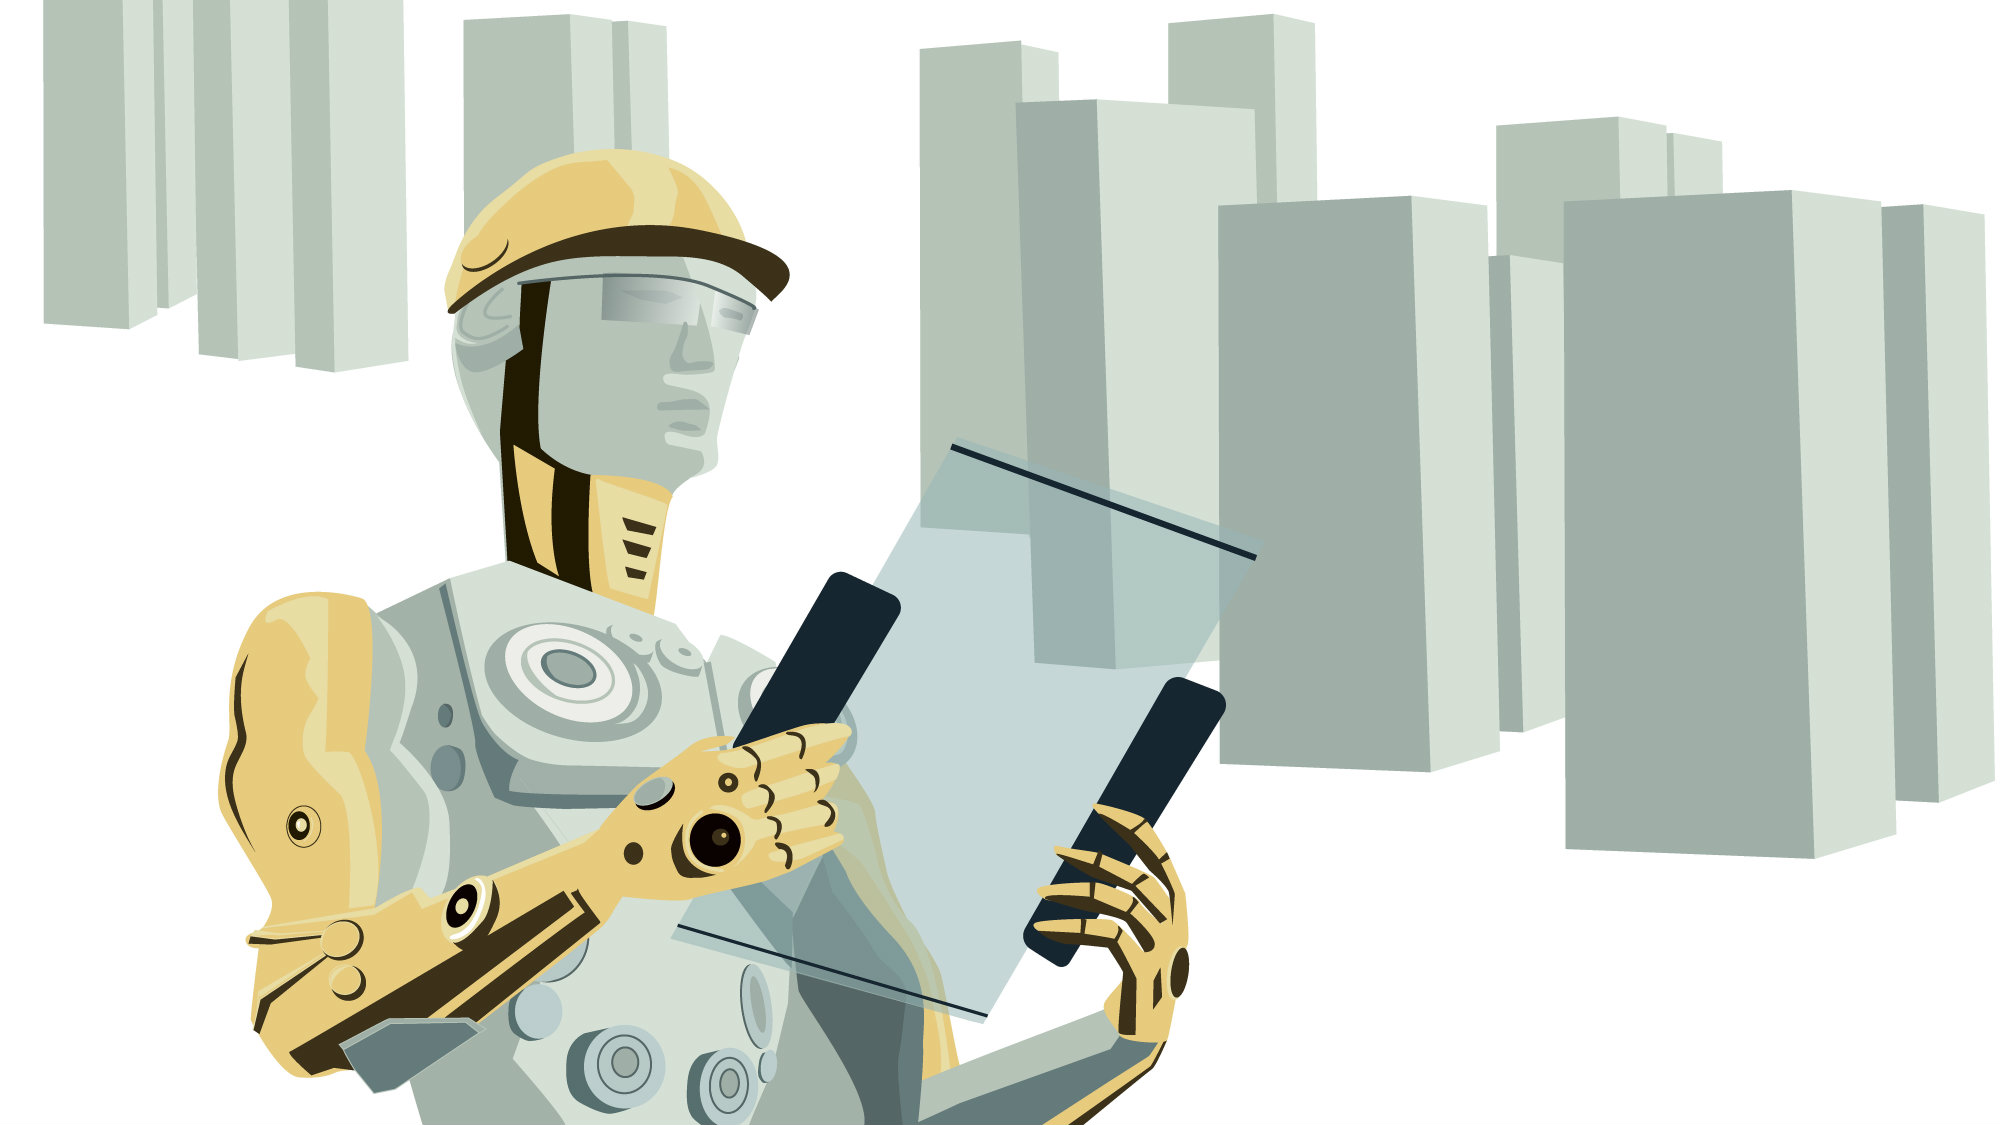 3 Robots Mechanizing Construction Sites Plus 3 To Watch